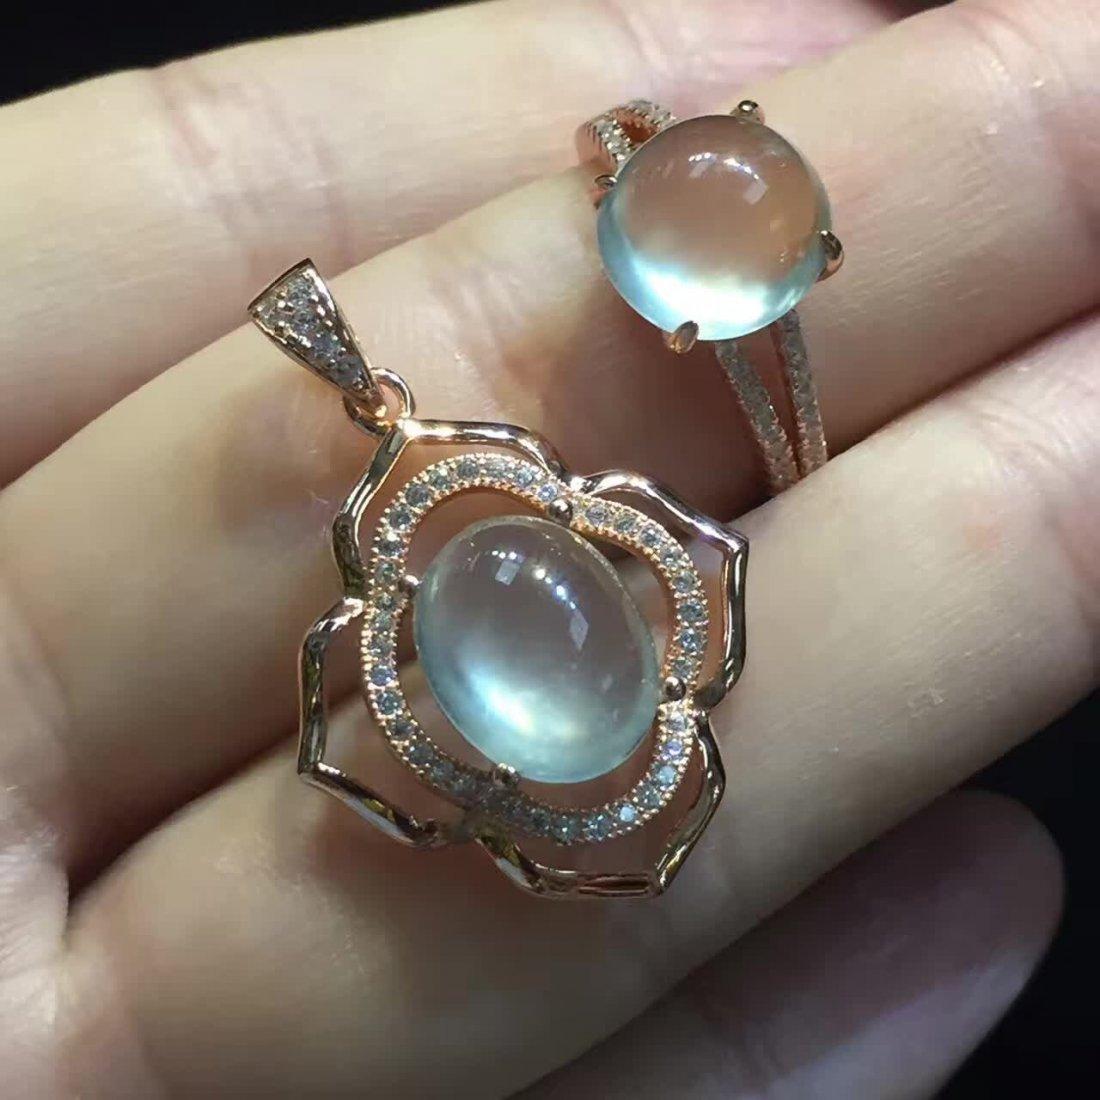 18k gold inlaid ice species emerald jade pendant ring - 4